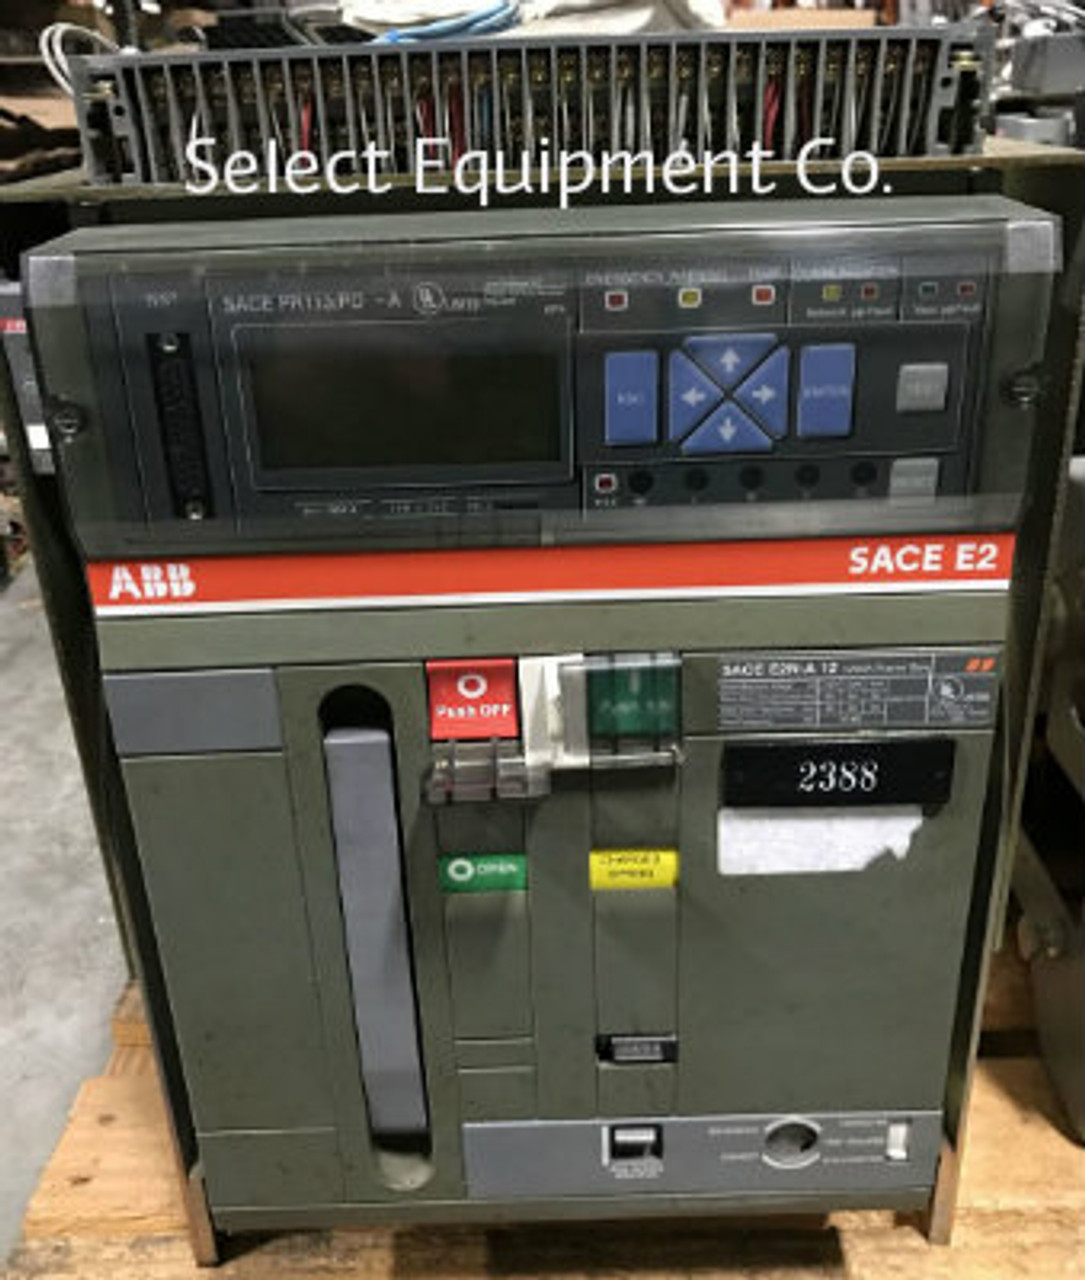 e2n a12 abb sace e2 1200 amp frame 800 amp trip circuit breaker rh selectequipment net ABB Breakers SACE abb sace e2 manual pdf